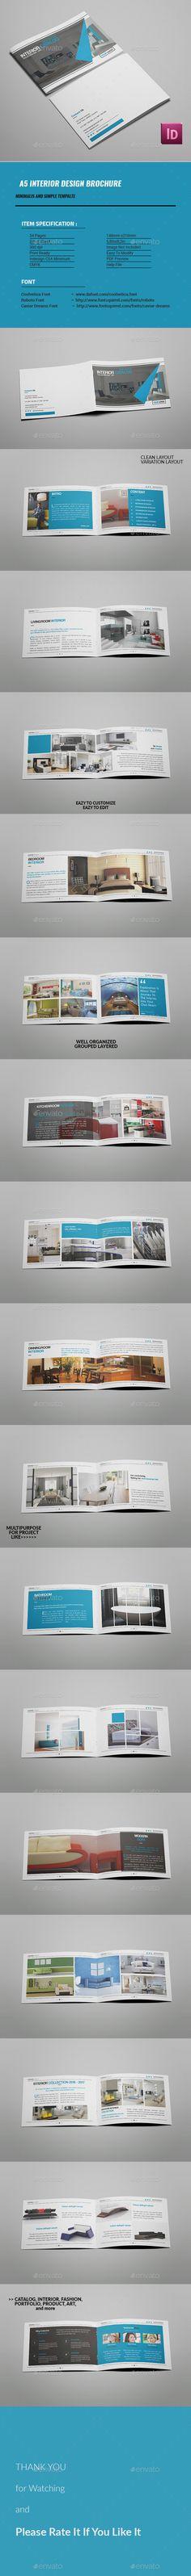 Interior Design Brochure Template InDesign INDD. Download here: http://graphicriver.net/item/interior-design-brochure/16703585?ref=ksioks